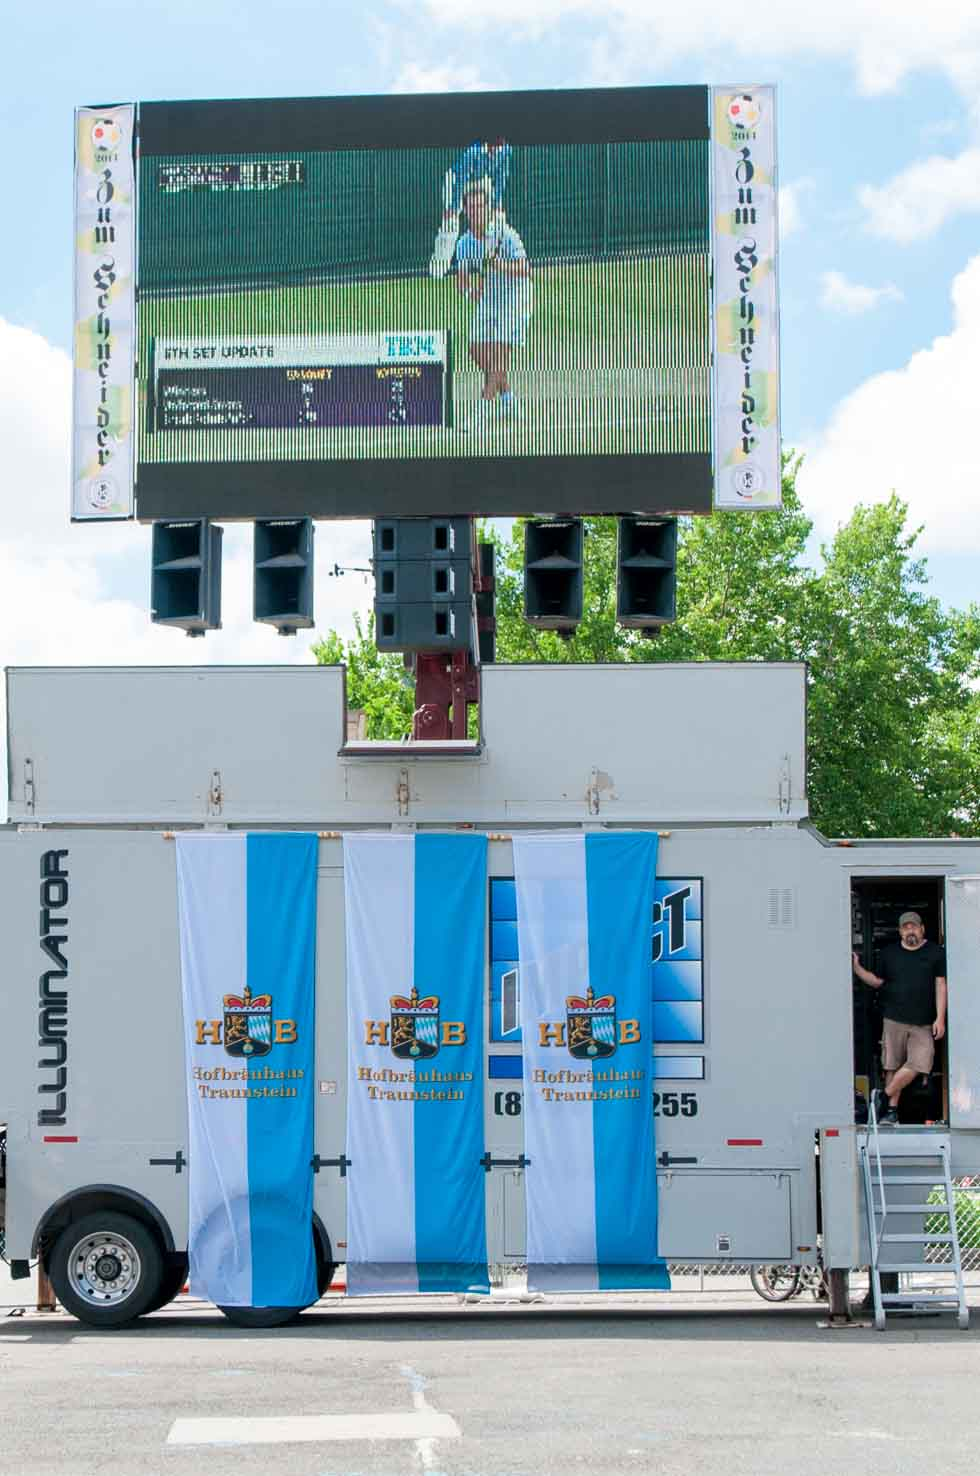 zum-schneider-nyc-2014-world-cup-germany-usa-0280.jpg